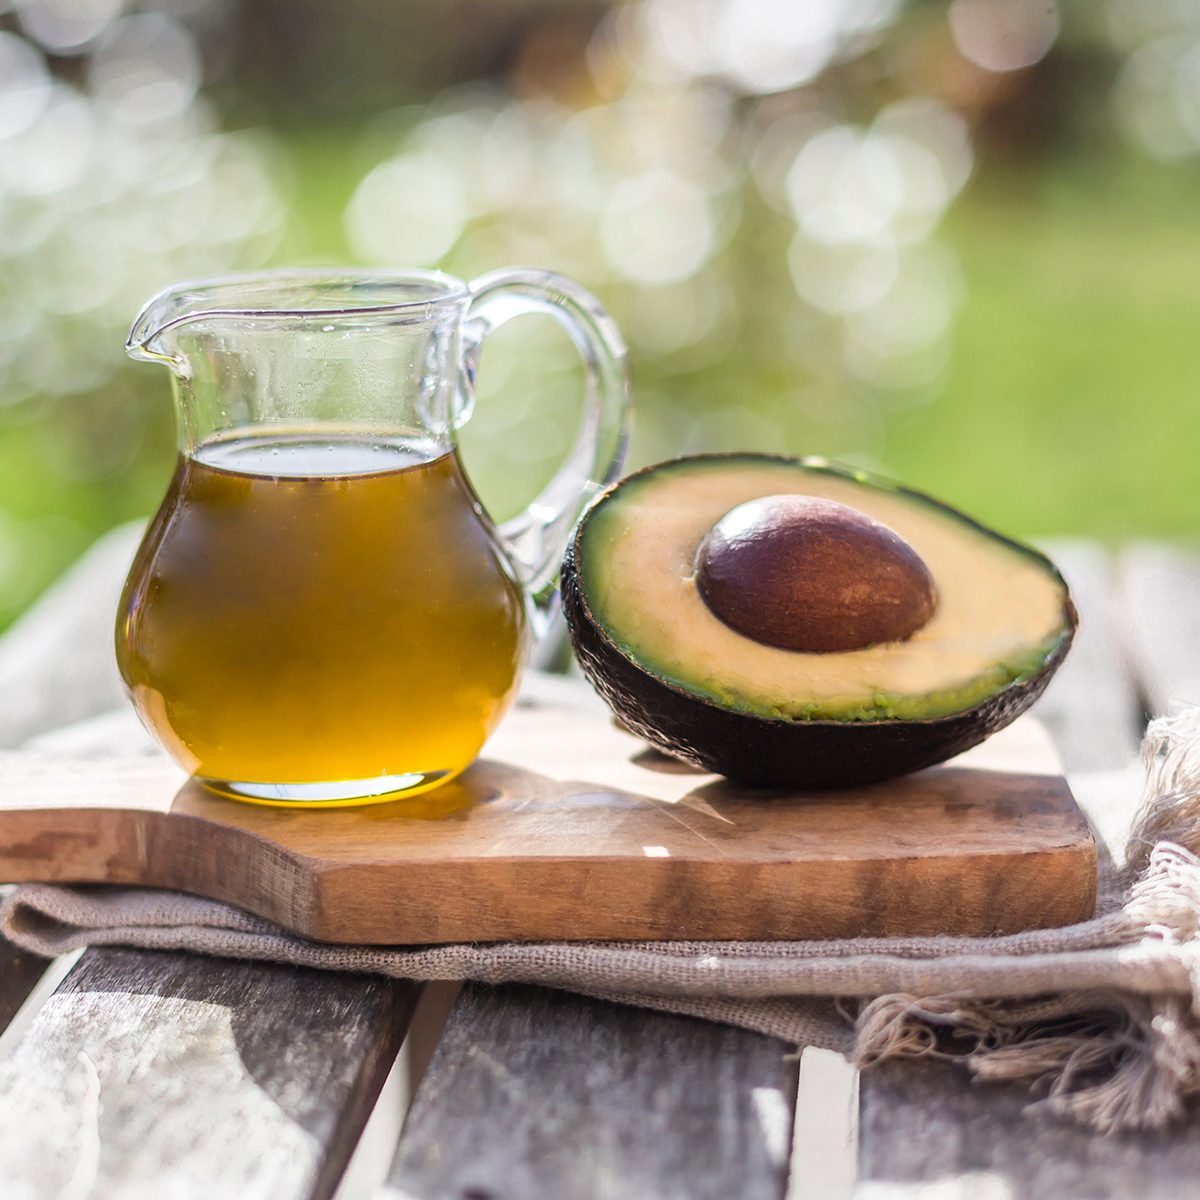 healthy oils Half of avocado and glass jug of avocado oil on wooden board